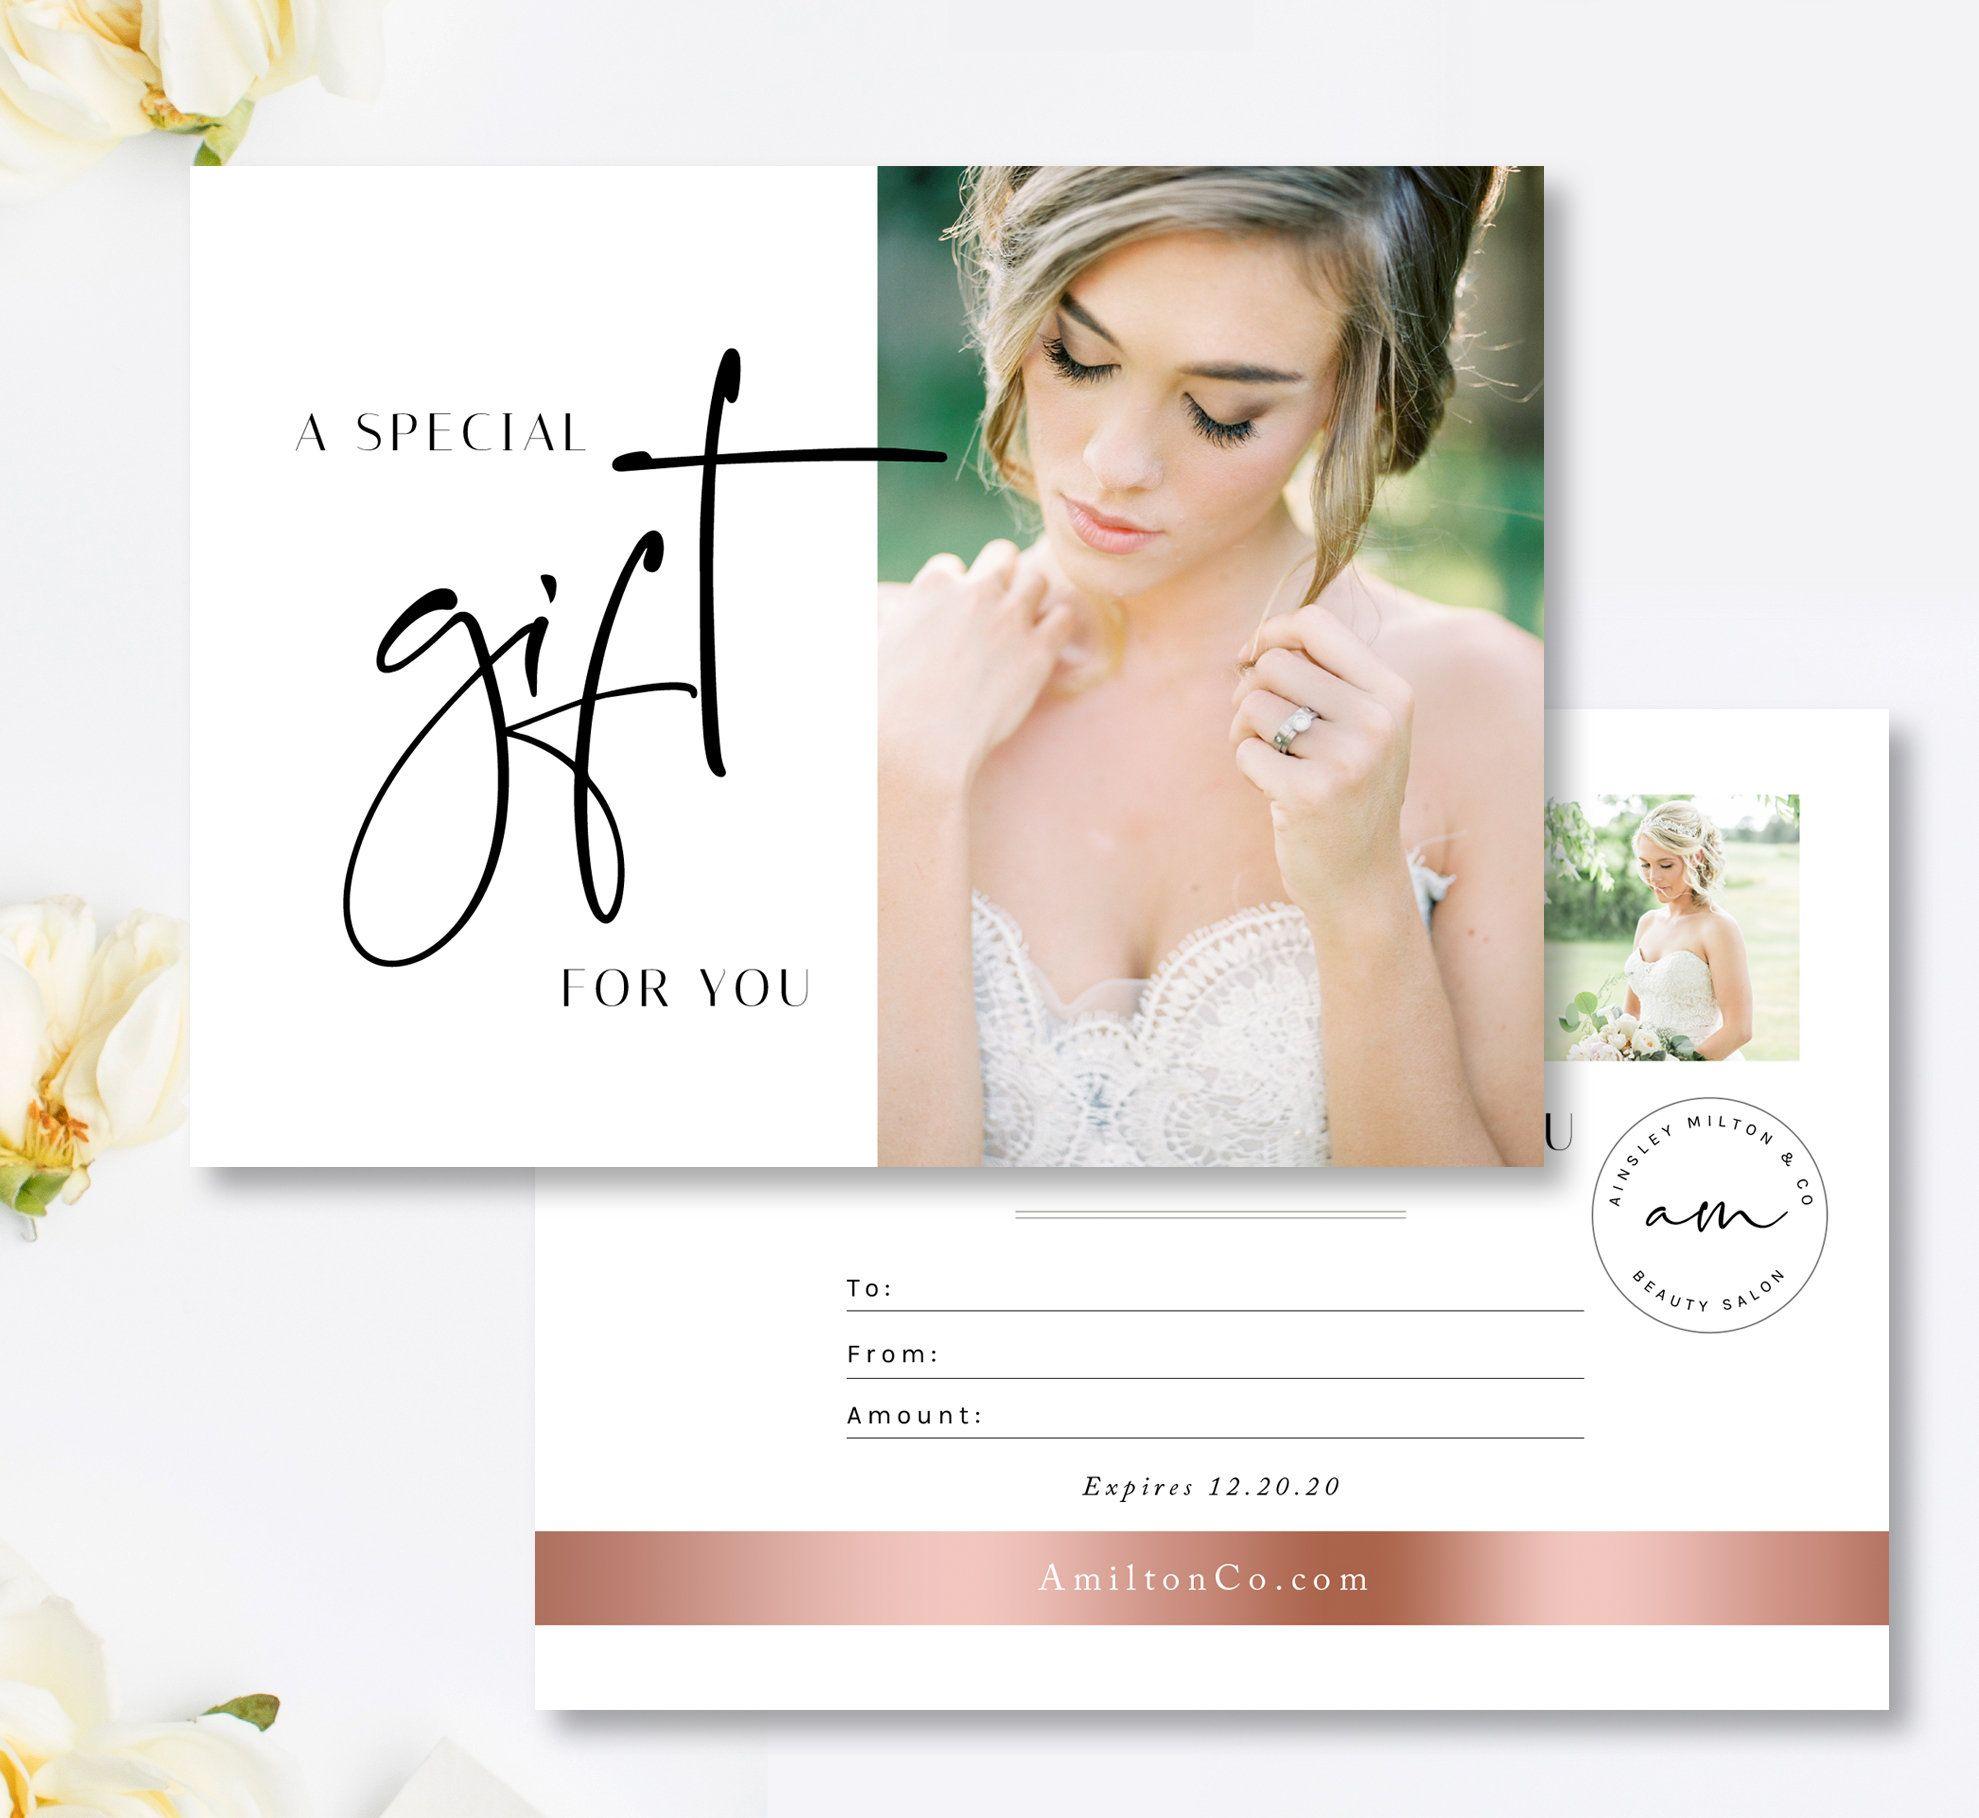 Salon Gift Card Template Gift Certificate Template Bridal Makeup Artist Gift Card S Salon Gift Card Photography Gift Certificate Template Gift Card Template